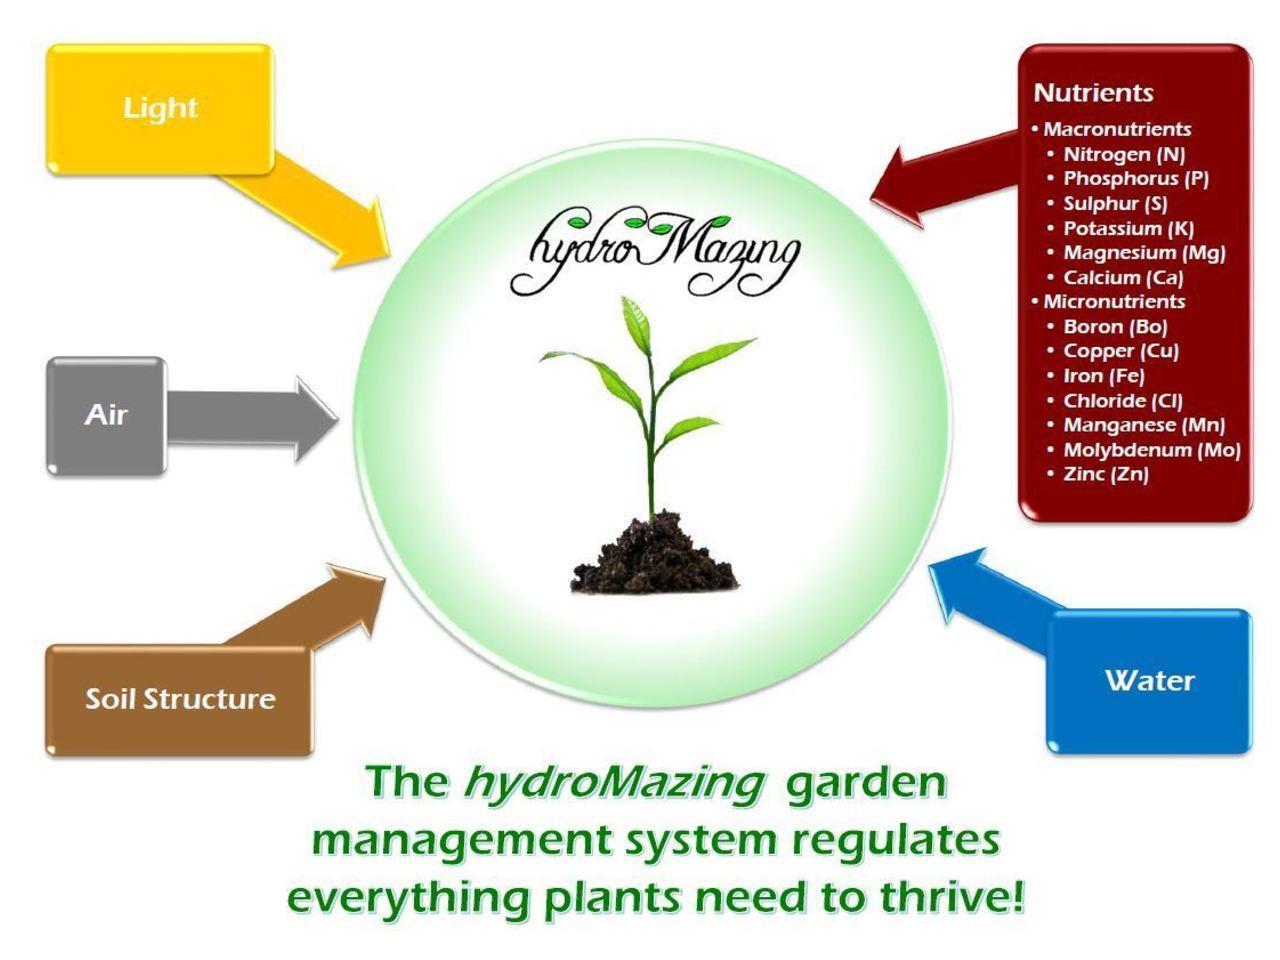 hydroMazing Smart Garden System